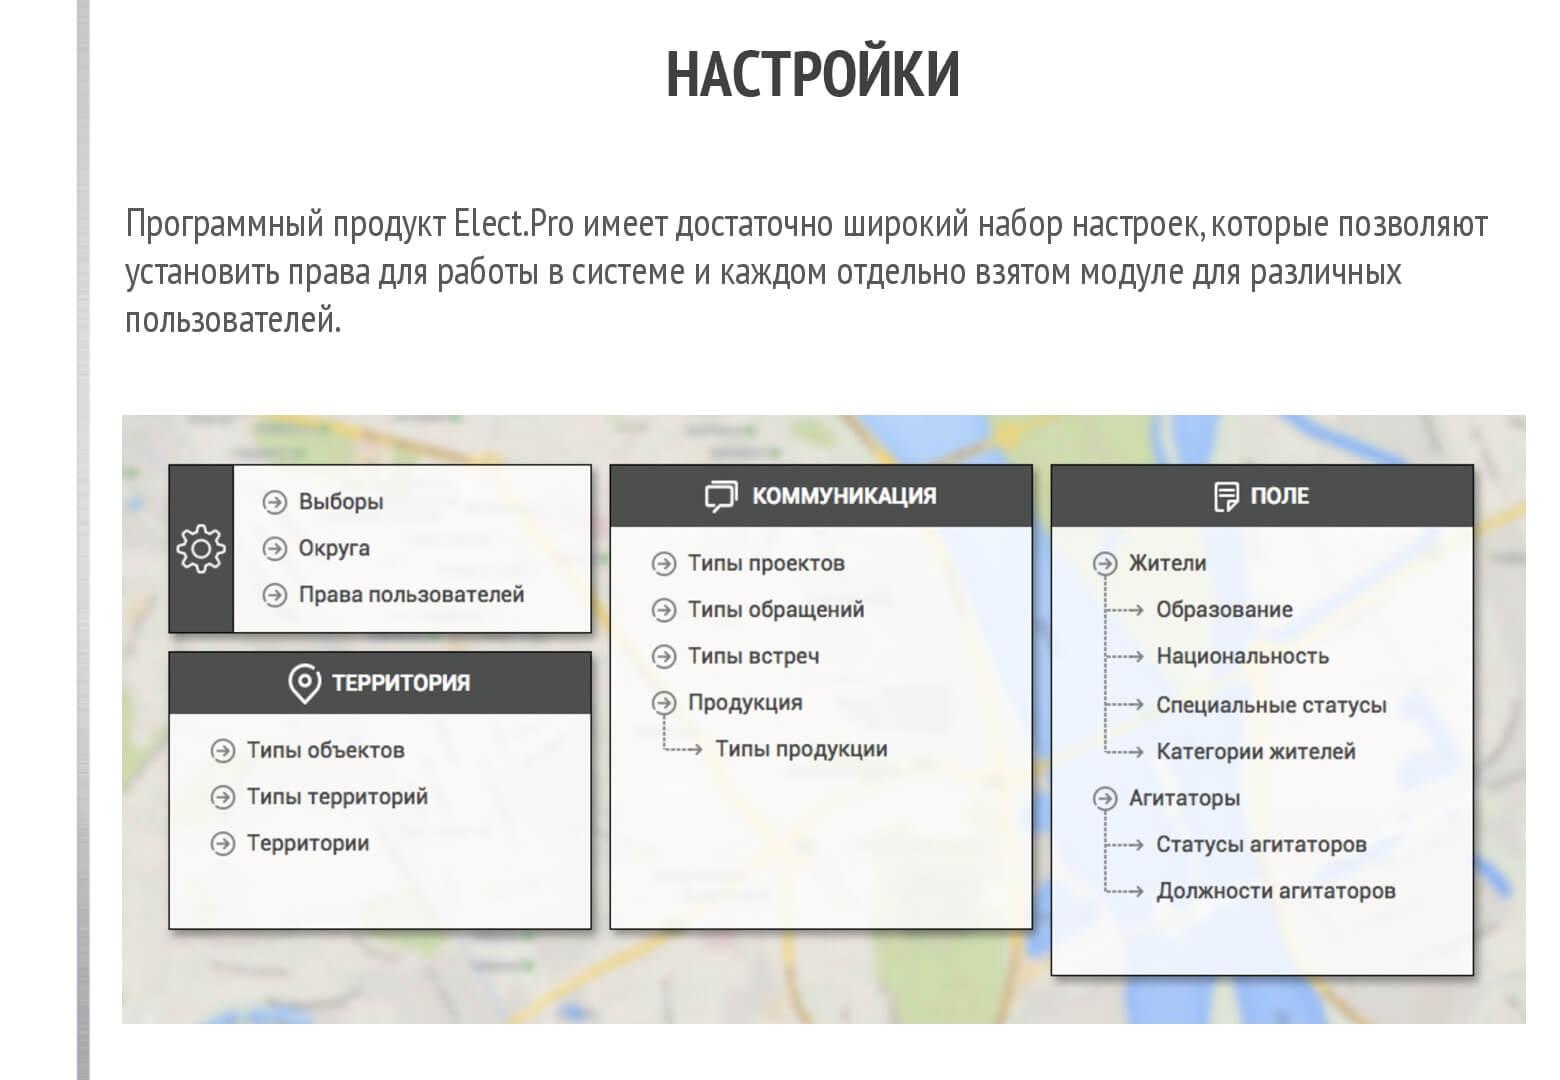 Elect.pro-BG-UA-021